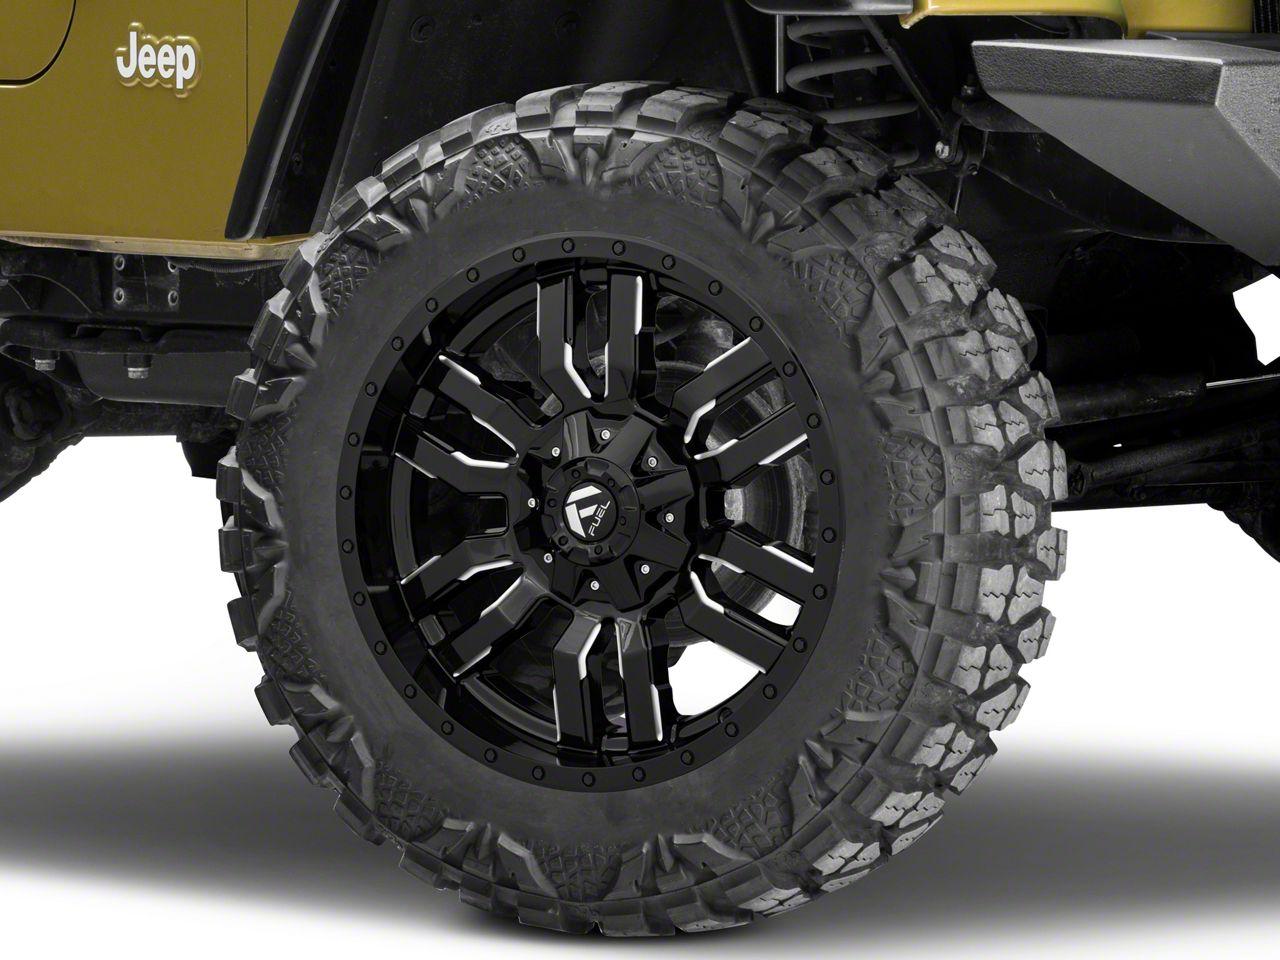 Fuel Wheels Sledge Gloss Black Milled Wheel - 20x9 (87-06 Jeep Wrangler YJ & TJ)